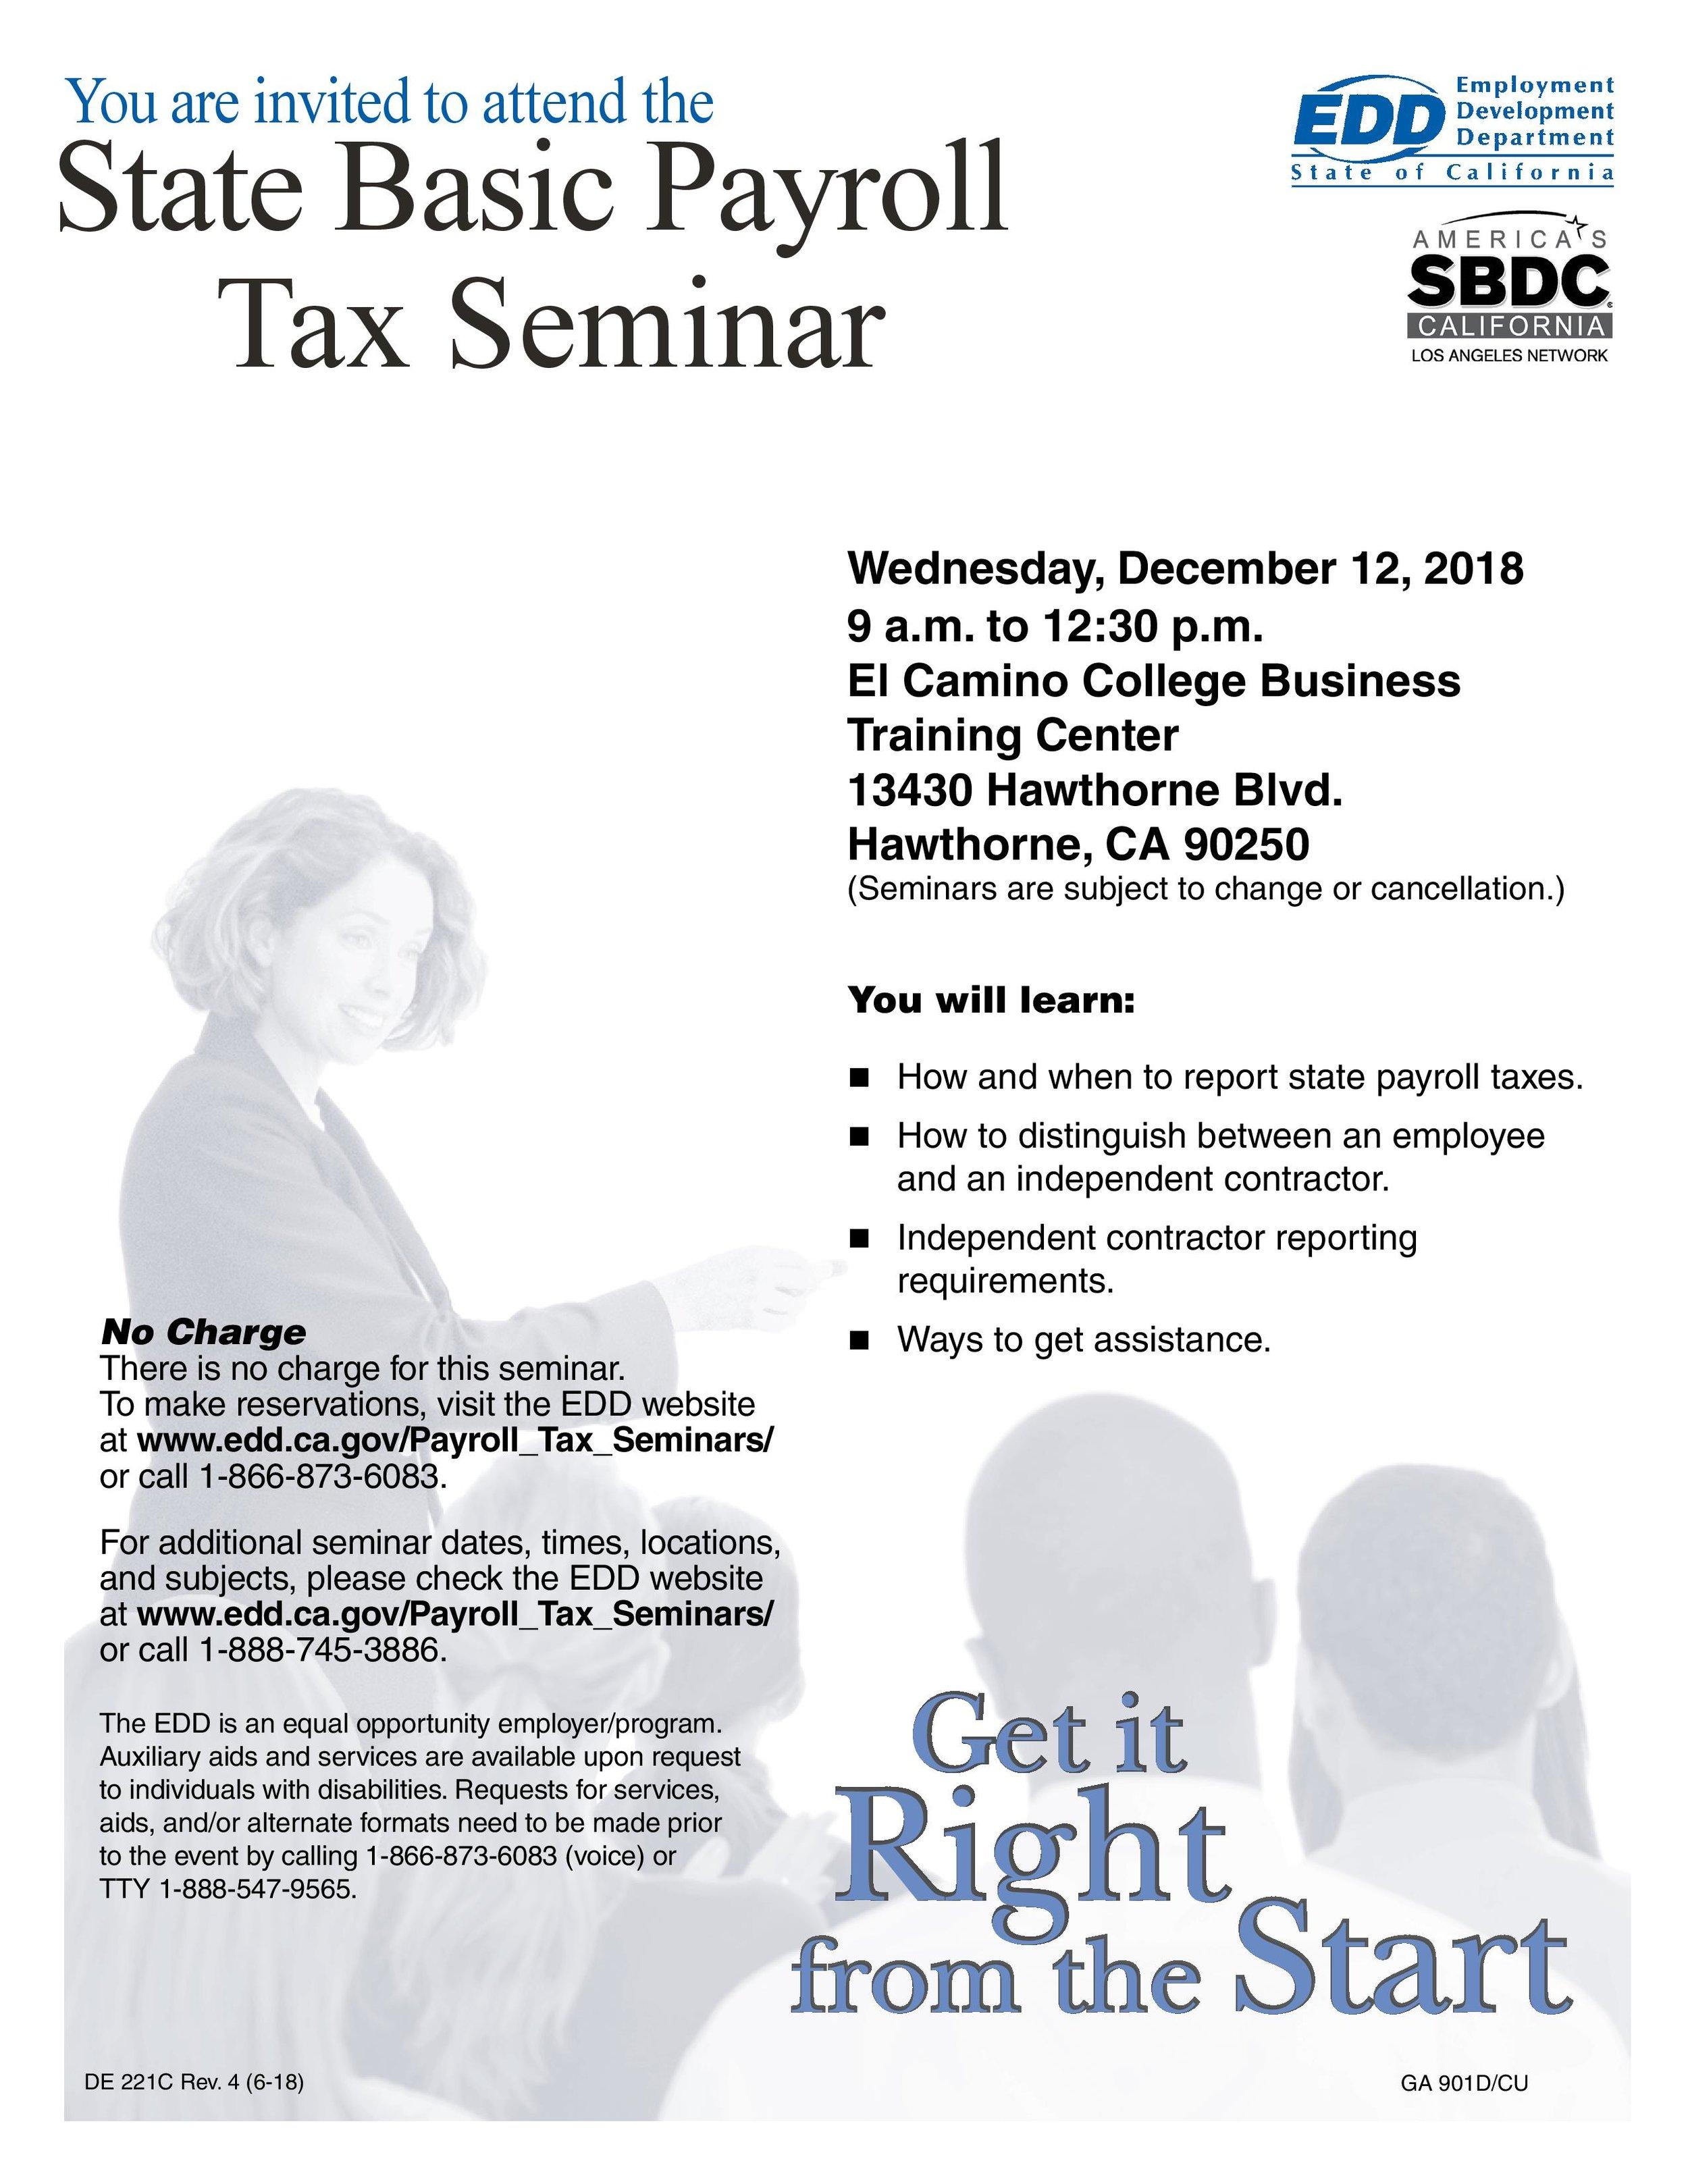 State basic payroll tax seminar - December 12th, 2018